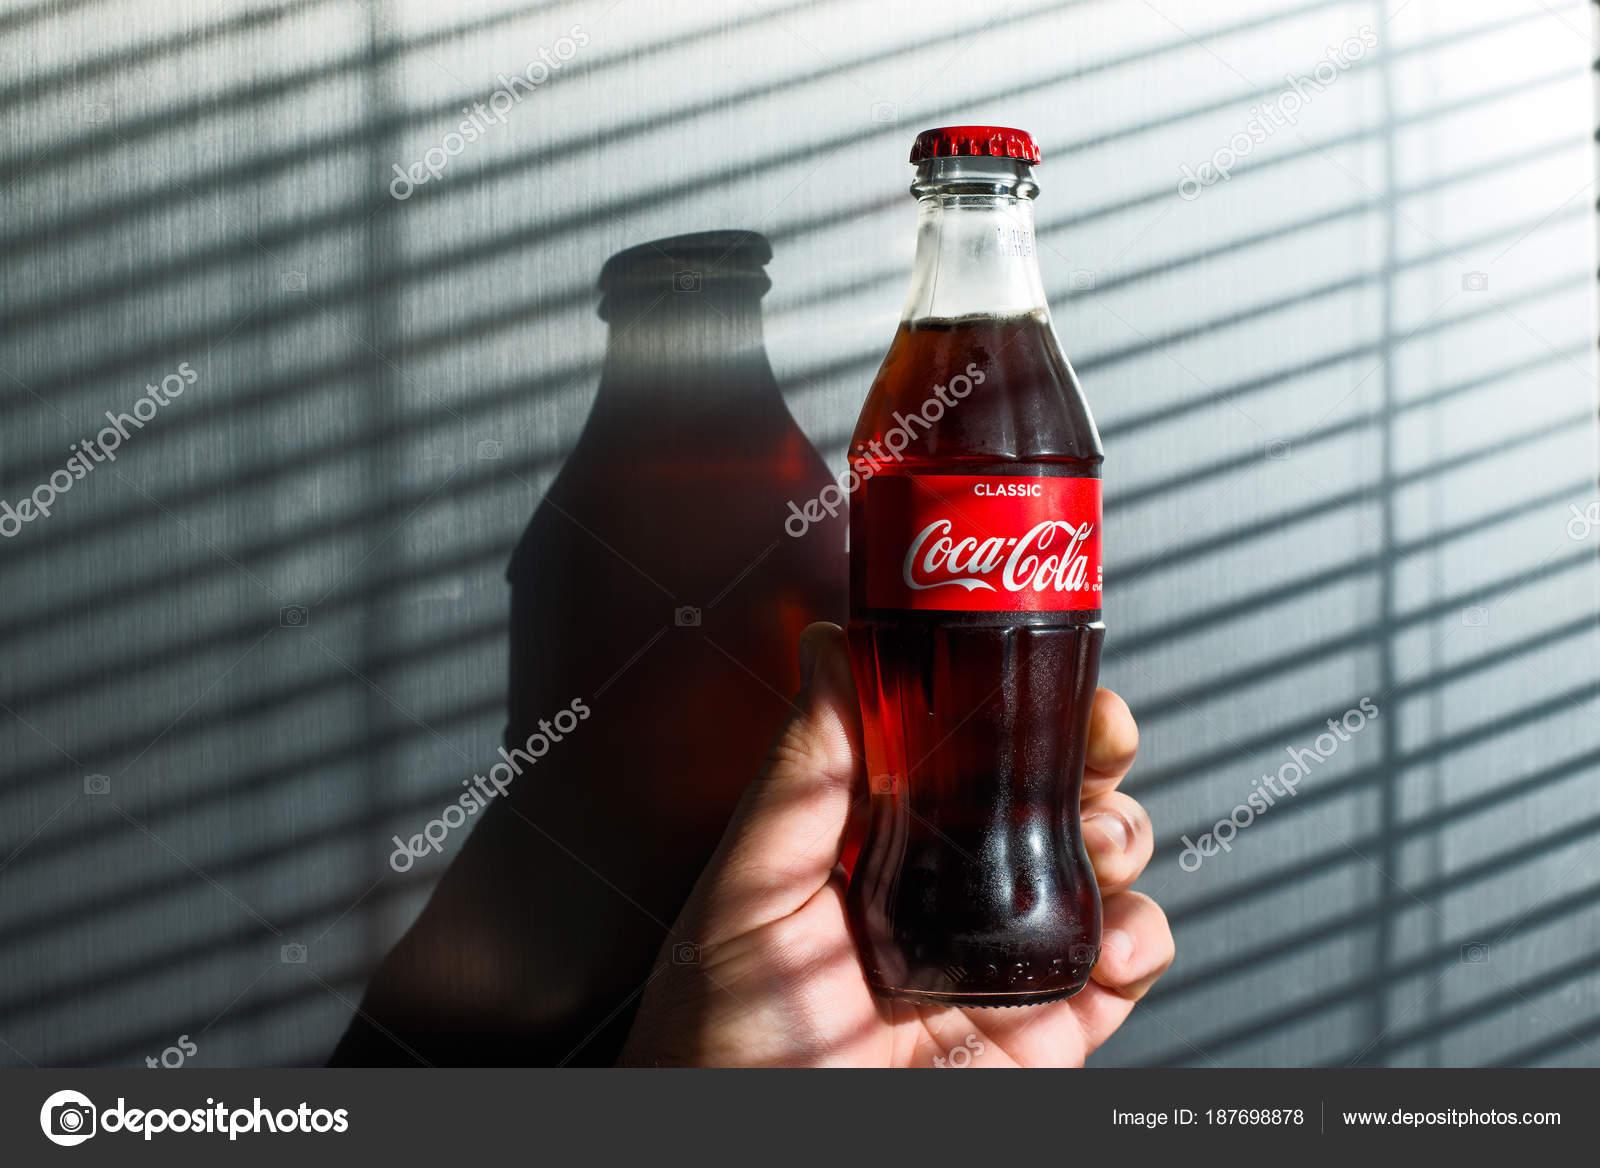 Amerikanischer Kühlschrank Coca Cola : Moskau russland februar foto von coca cola classic